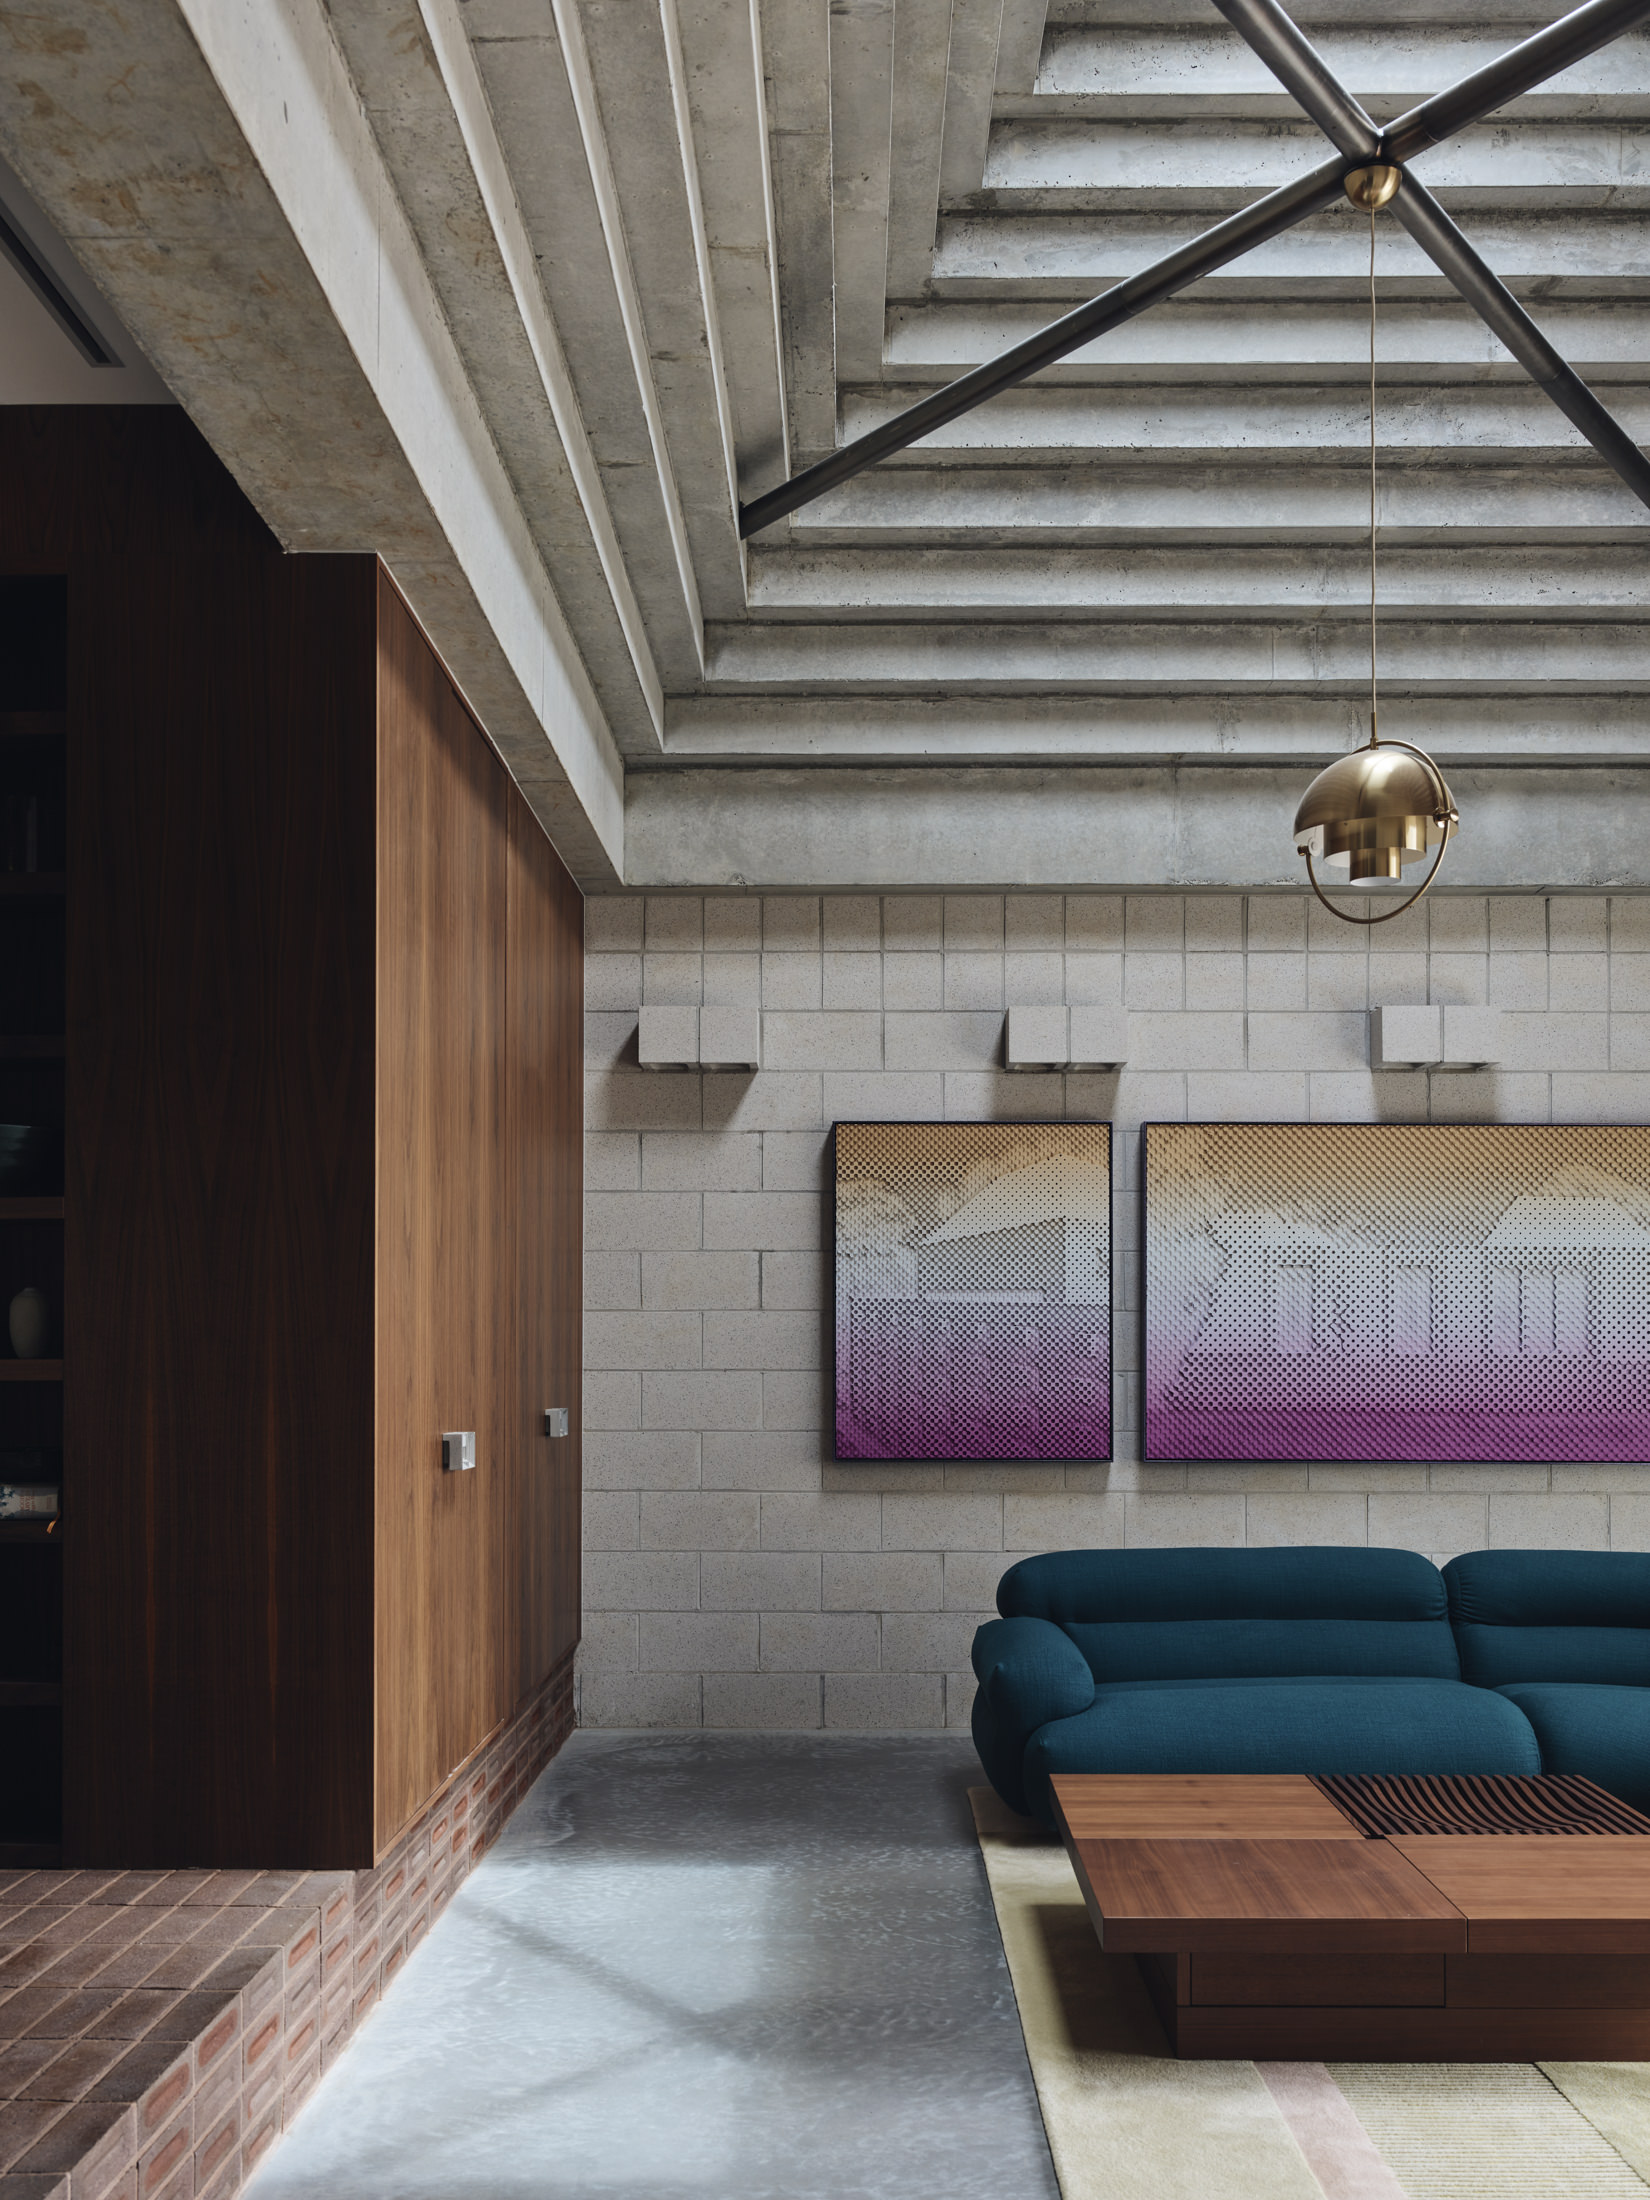 Architects Eat Bellows Beach House Flinders Masonry Architecture Photo Derek Swalwell Yellowtrace 17